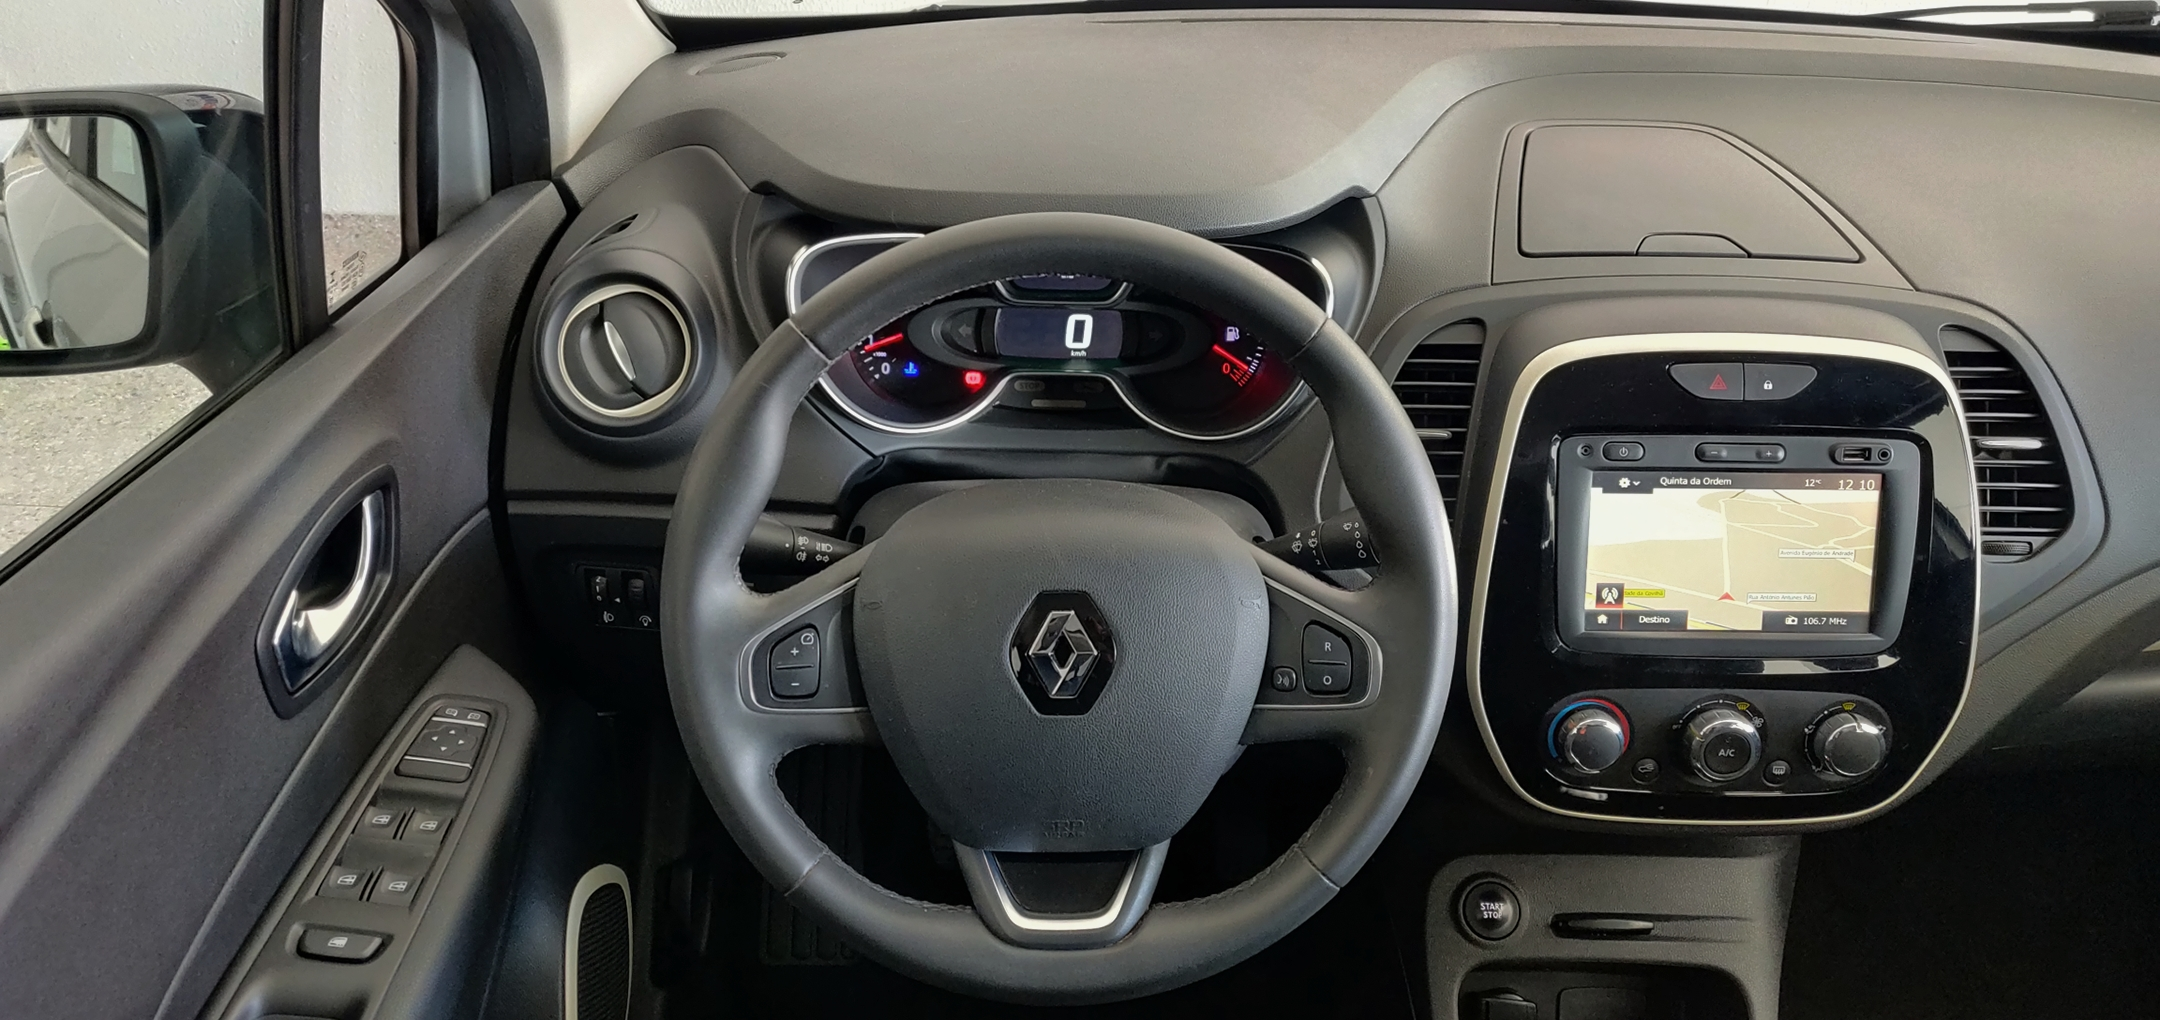 Renault Captur 1.5 Dci   Imagem 10